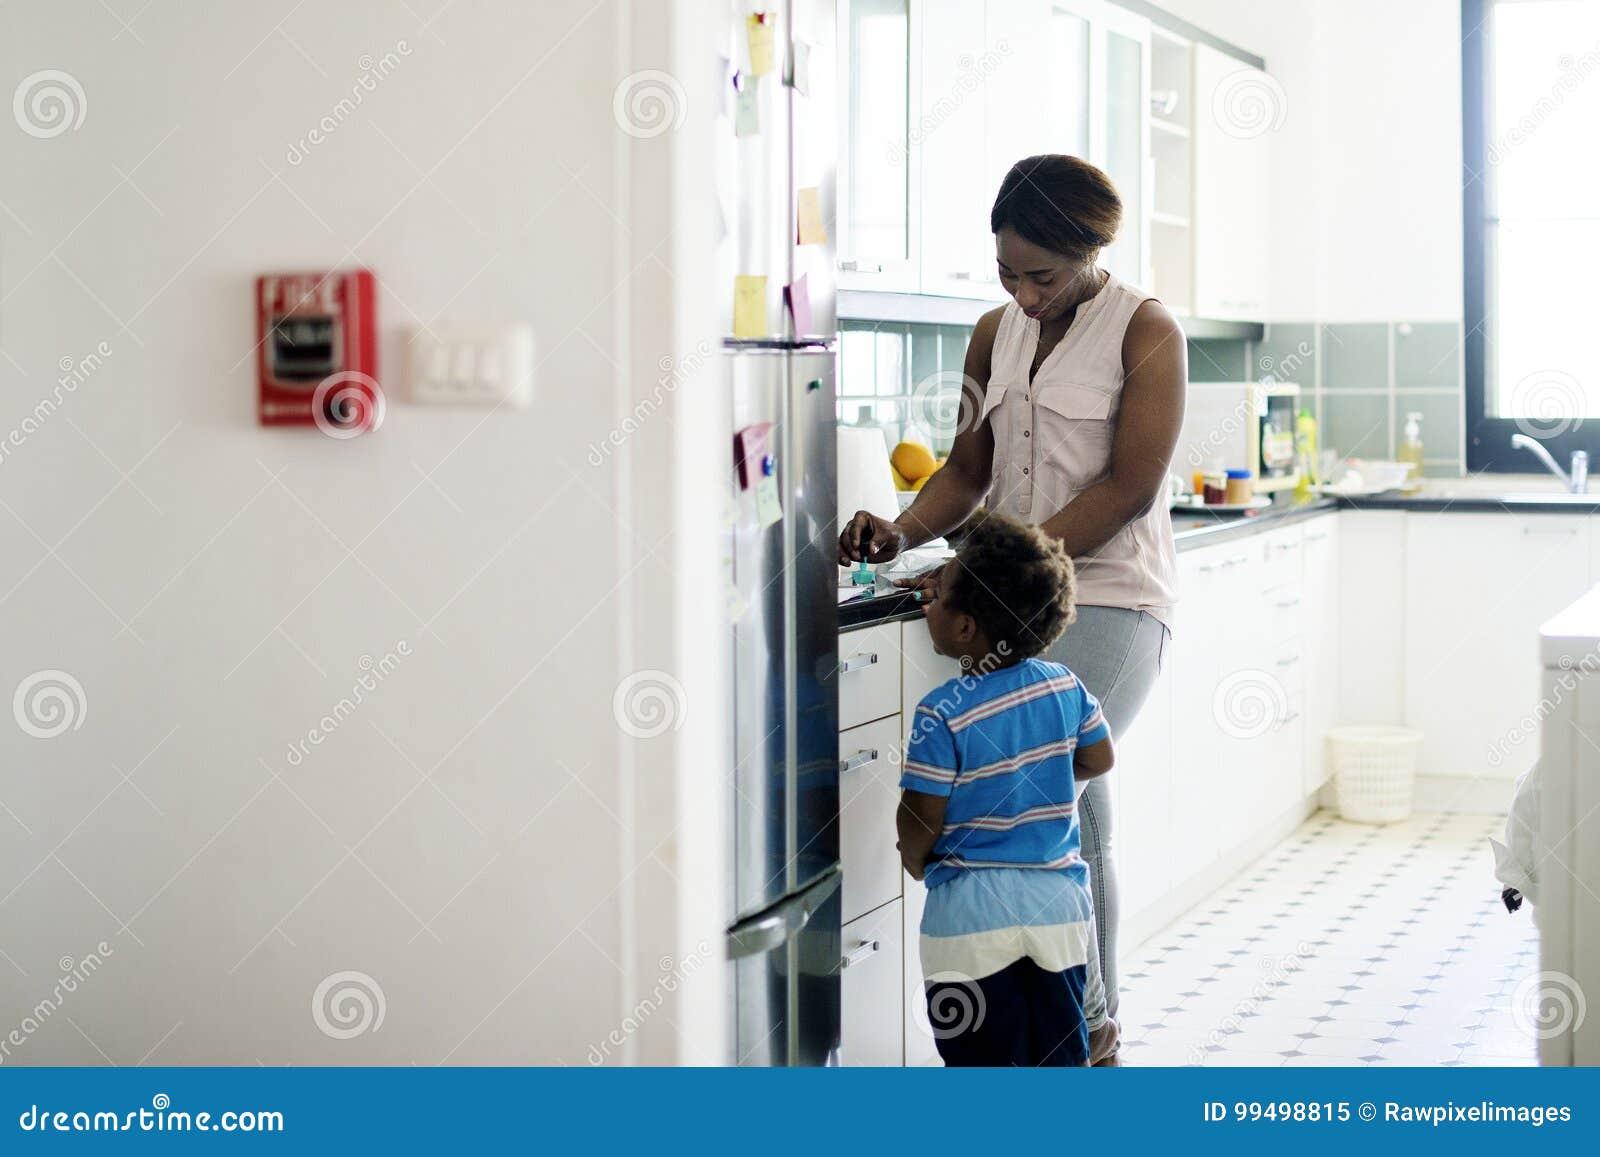 Single mom enjoying precious time with her child